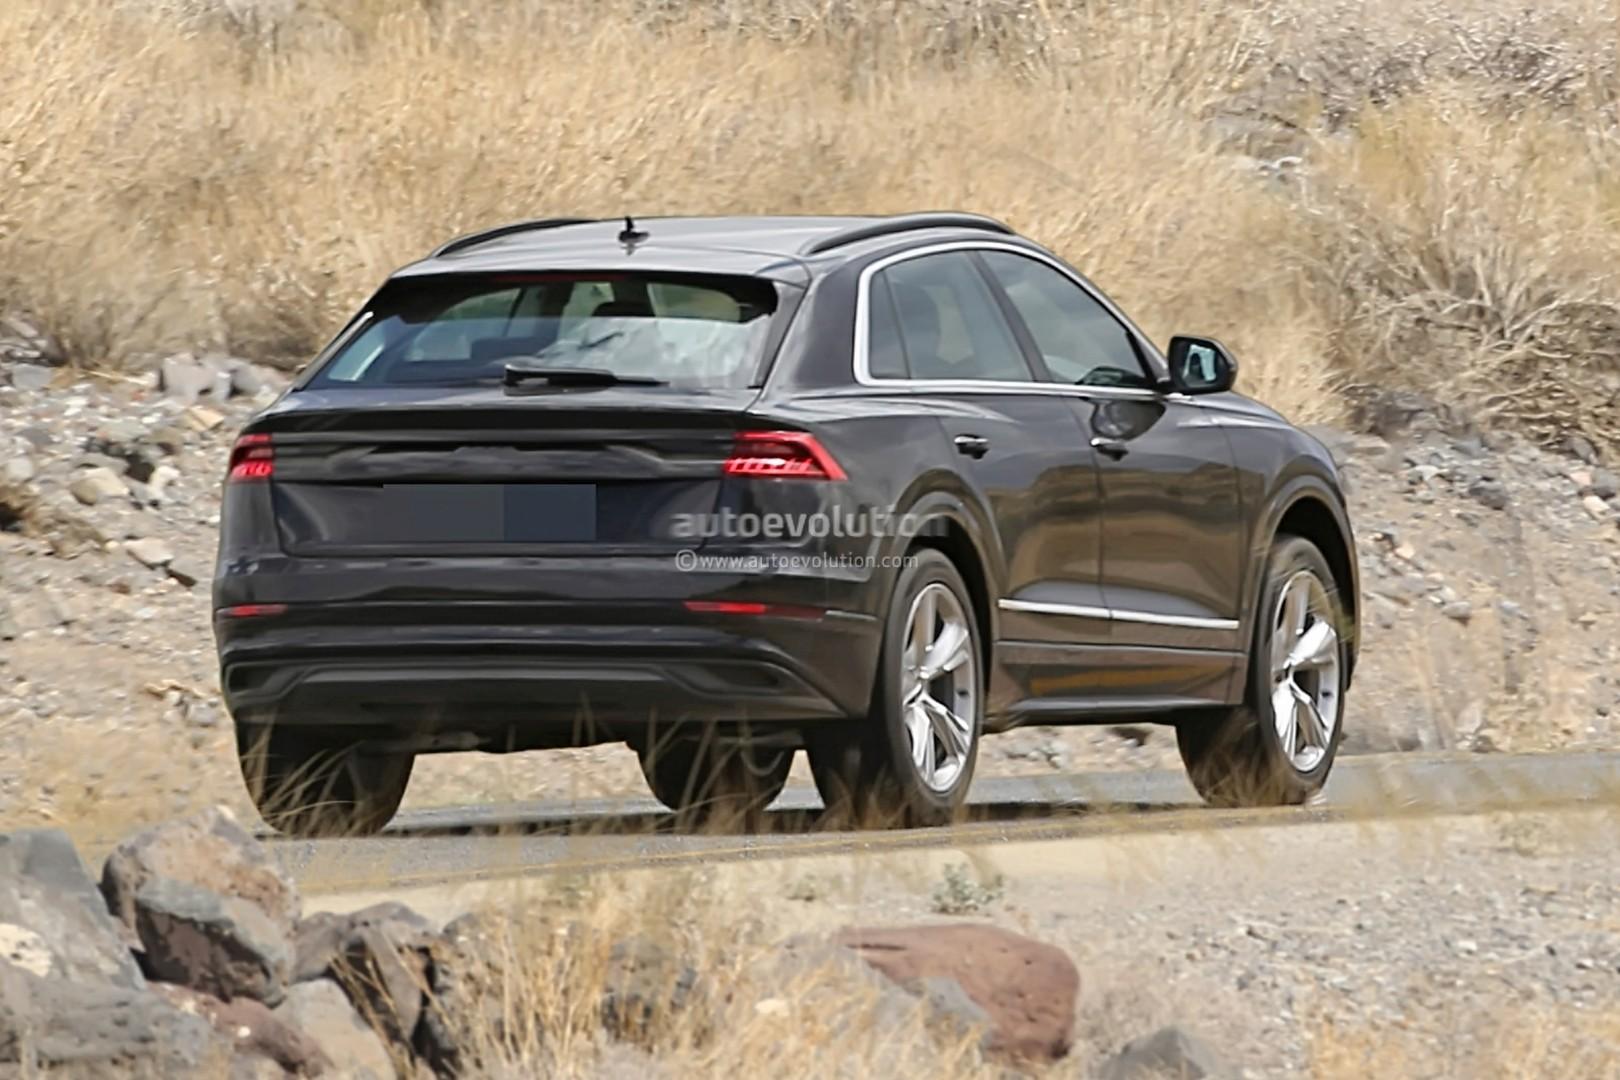 Audi Q8 Halo SUV Model Confirmed: Q7 Platform and Prologue Concept Design - autoevolution